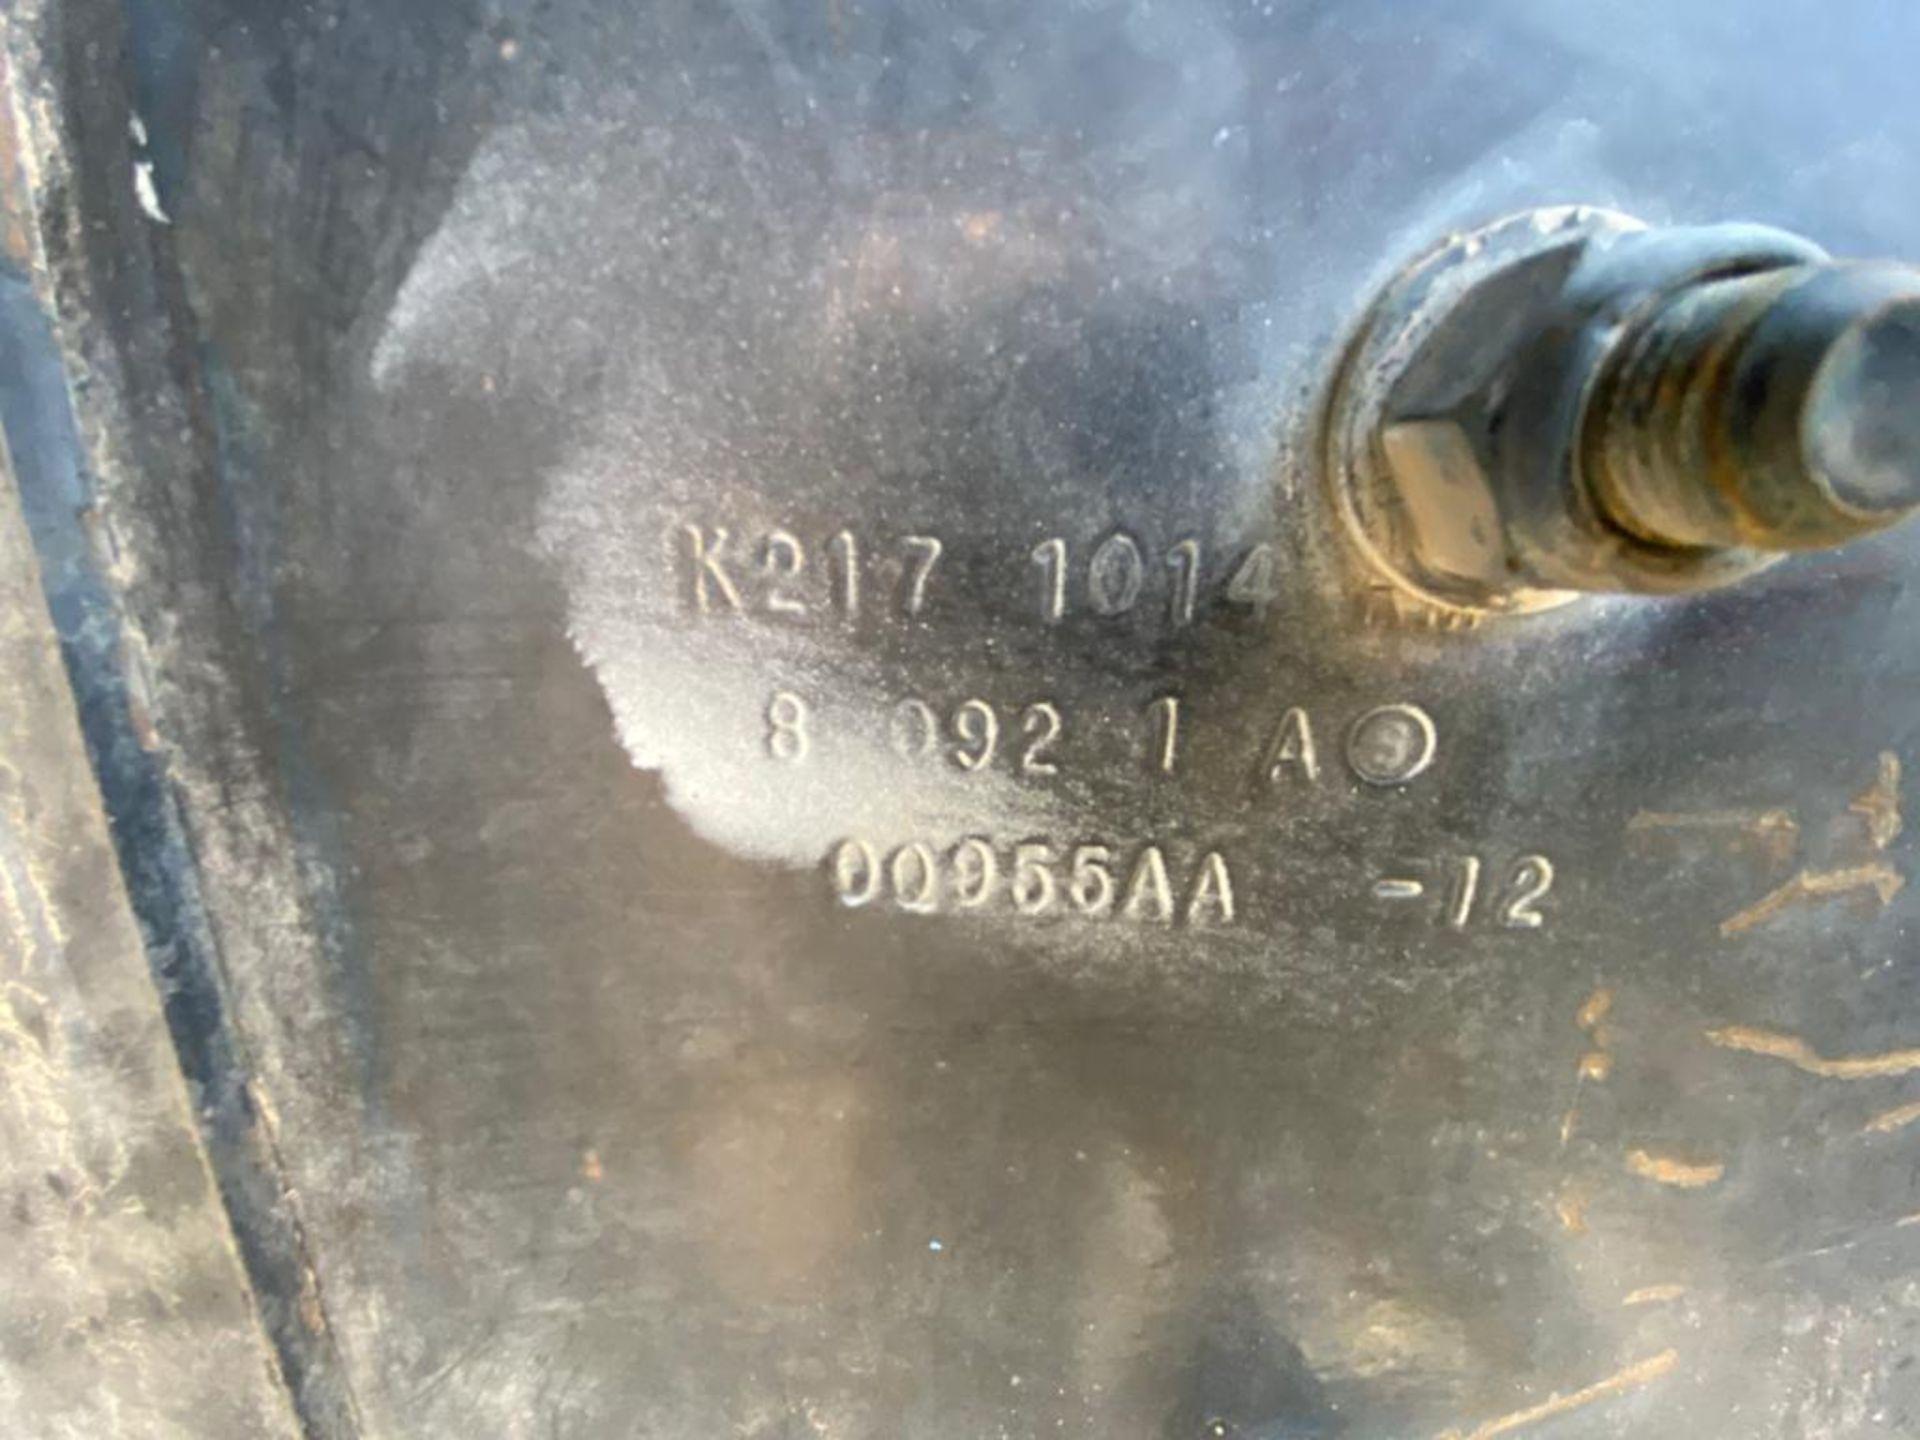 1998 Kenworth 5000 Gallon, standard transmission of 16 speeds - Image 59 of 68